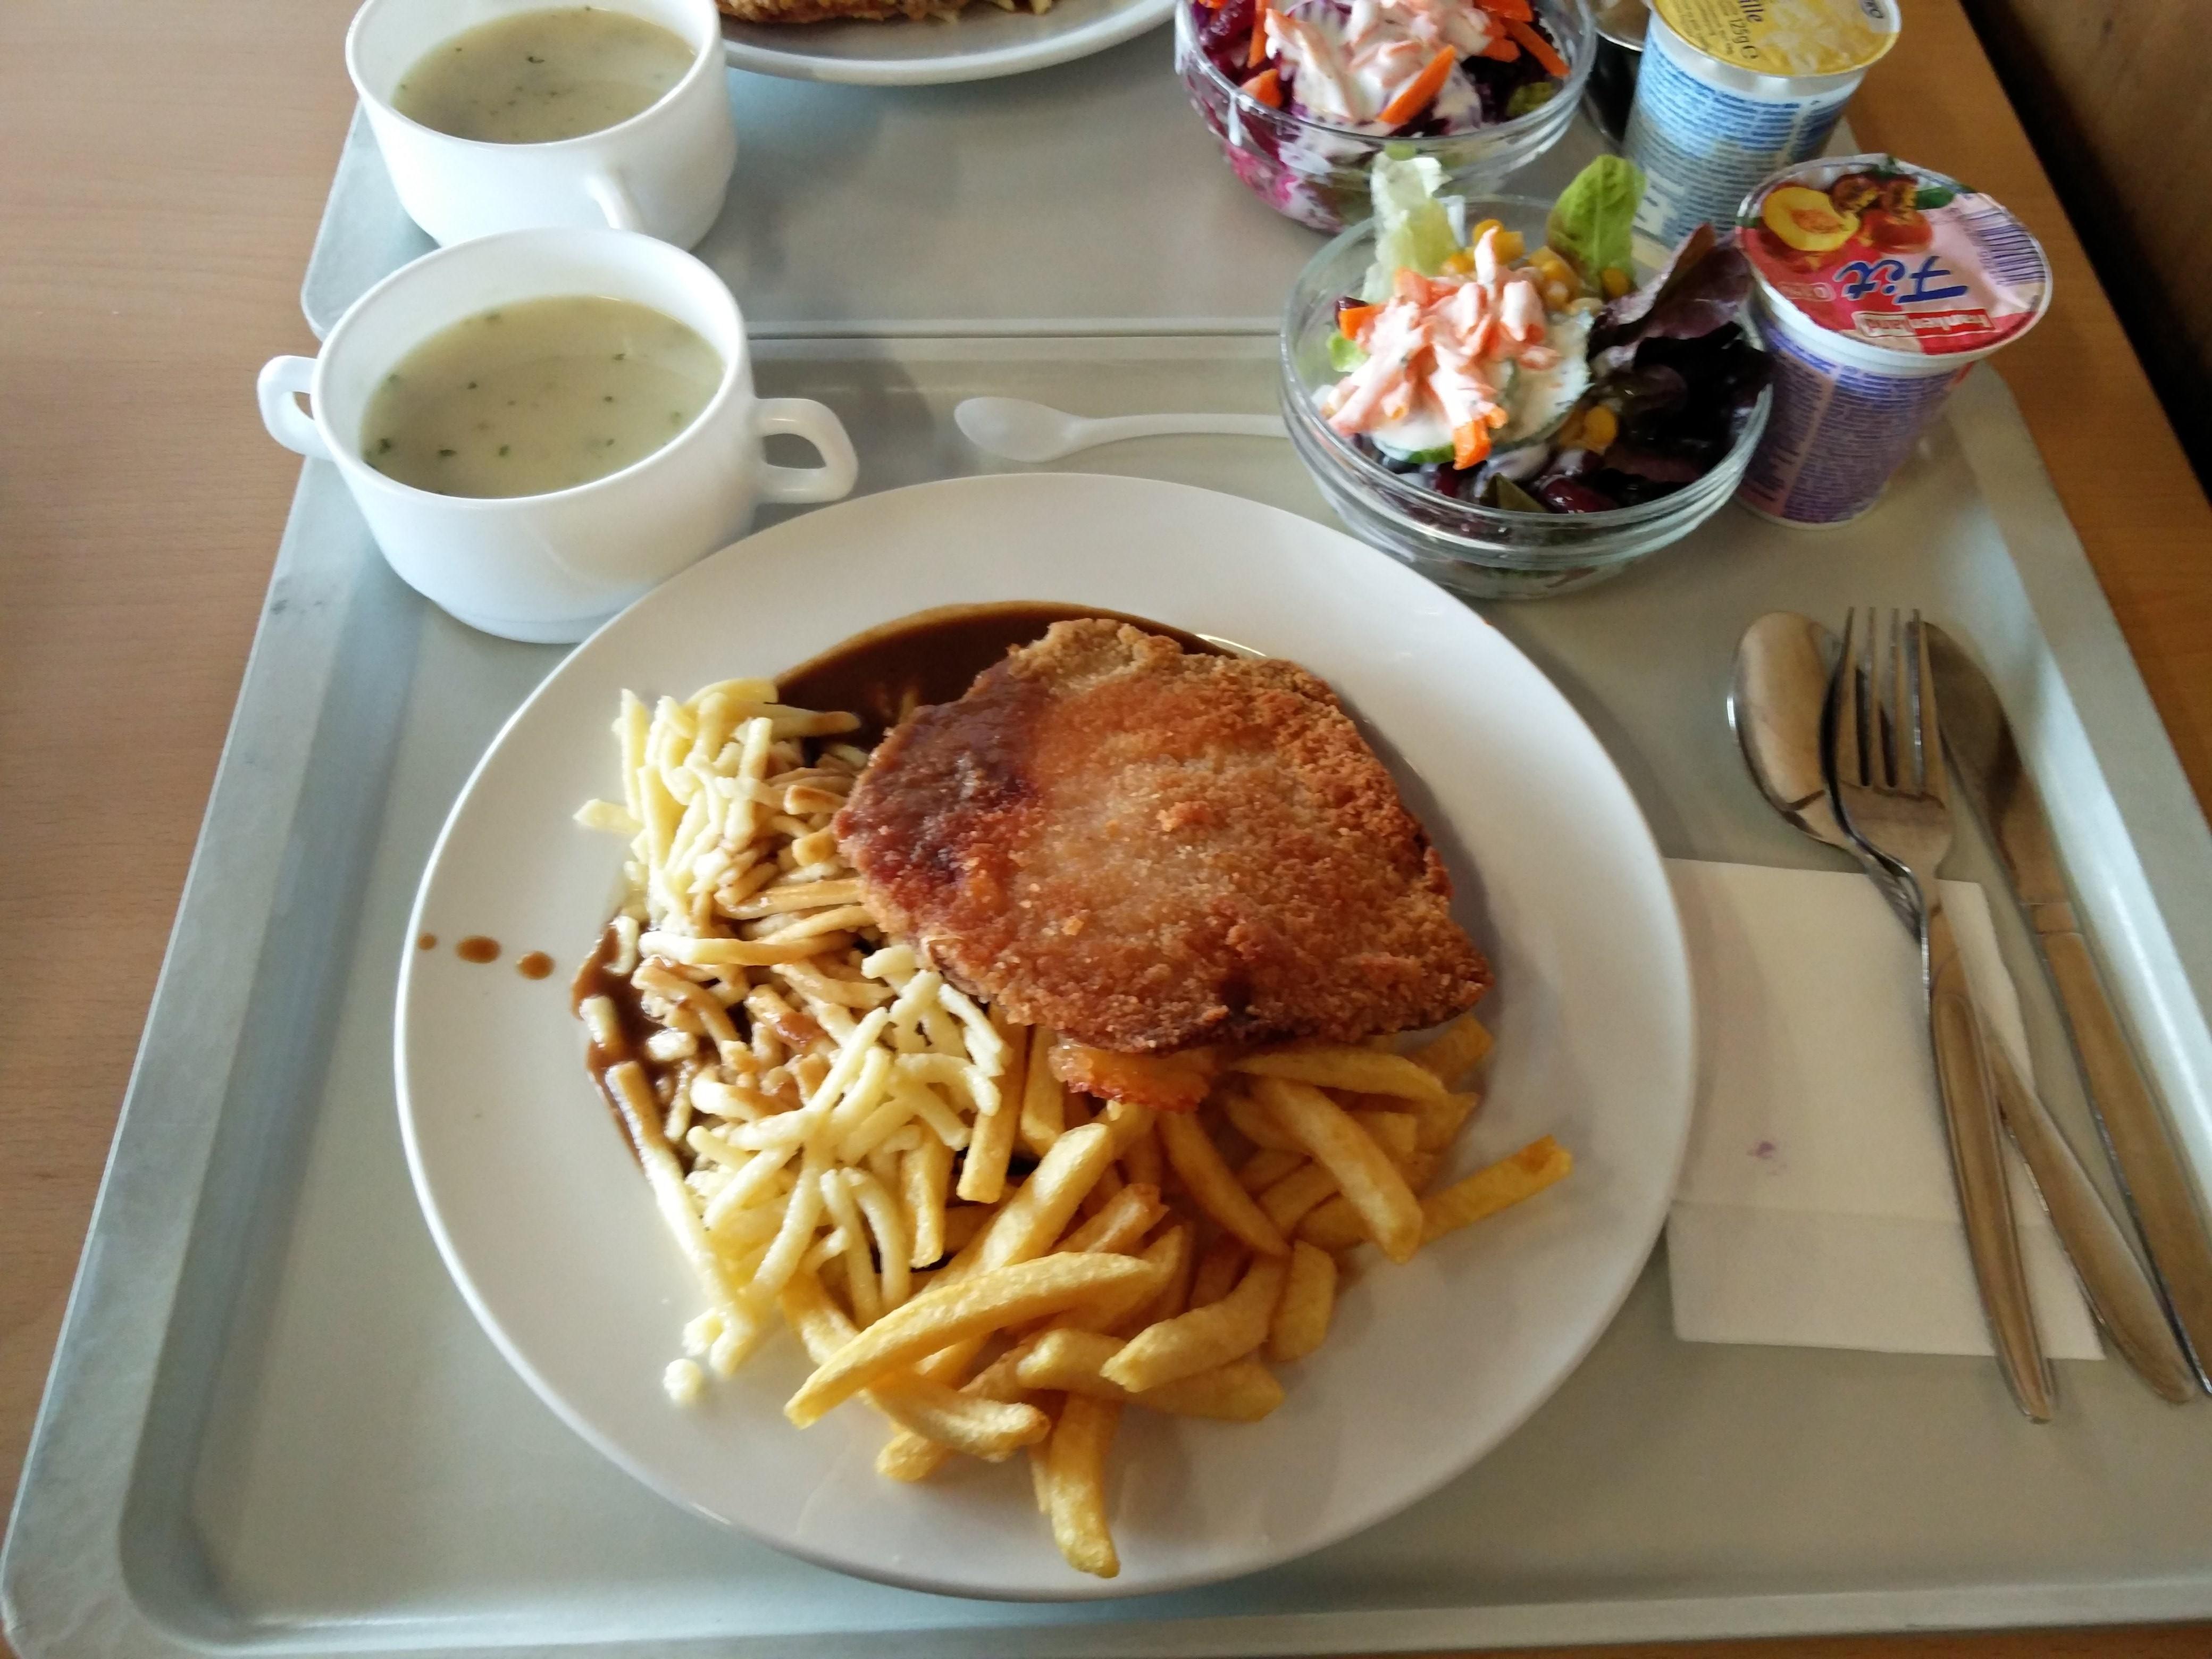 https://foodloader.net/nico_2016-11-17_cordon-bleu-mit-spaetzle-pommes-suppe-salat-und-joghurt.jpg